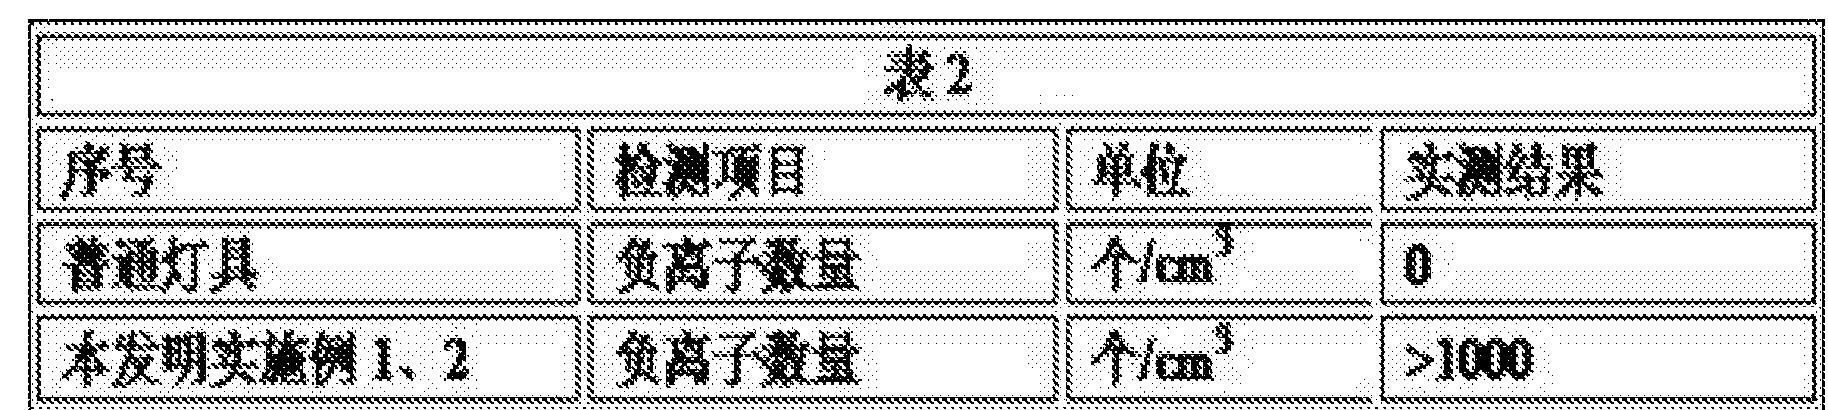 Figure CN106189659AD00122